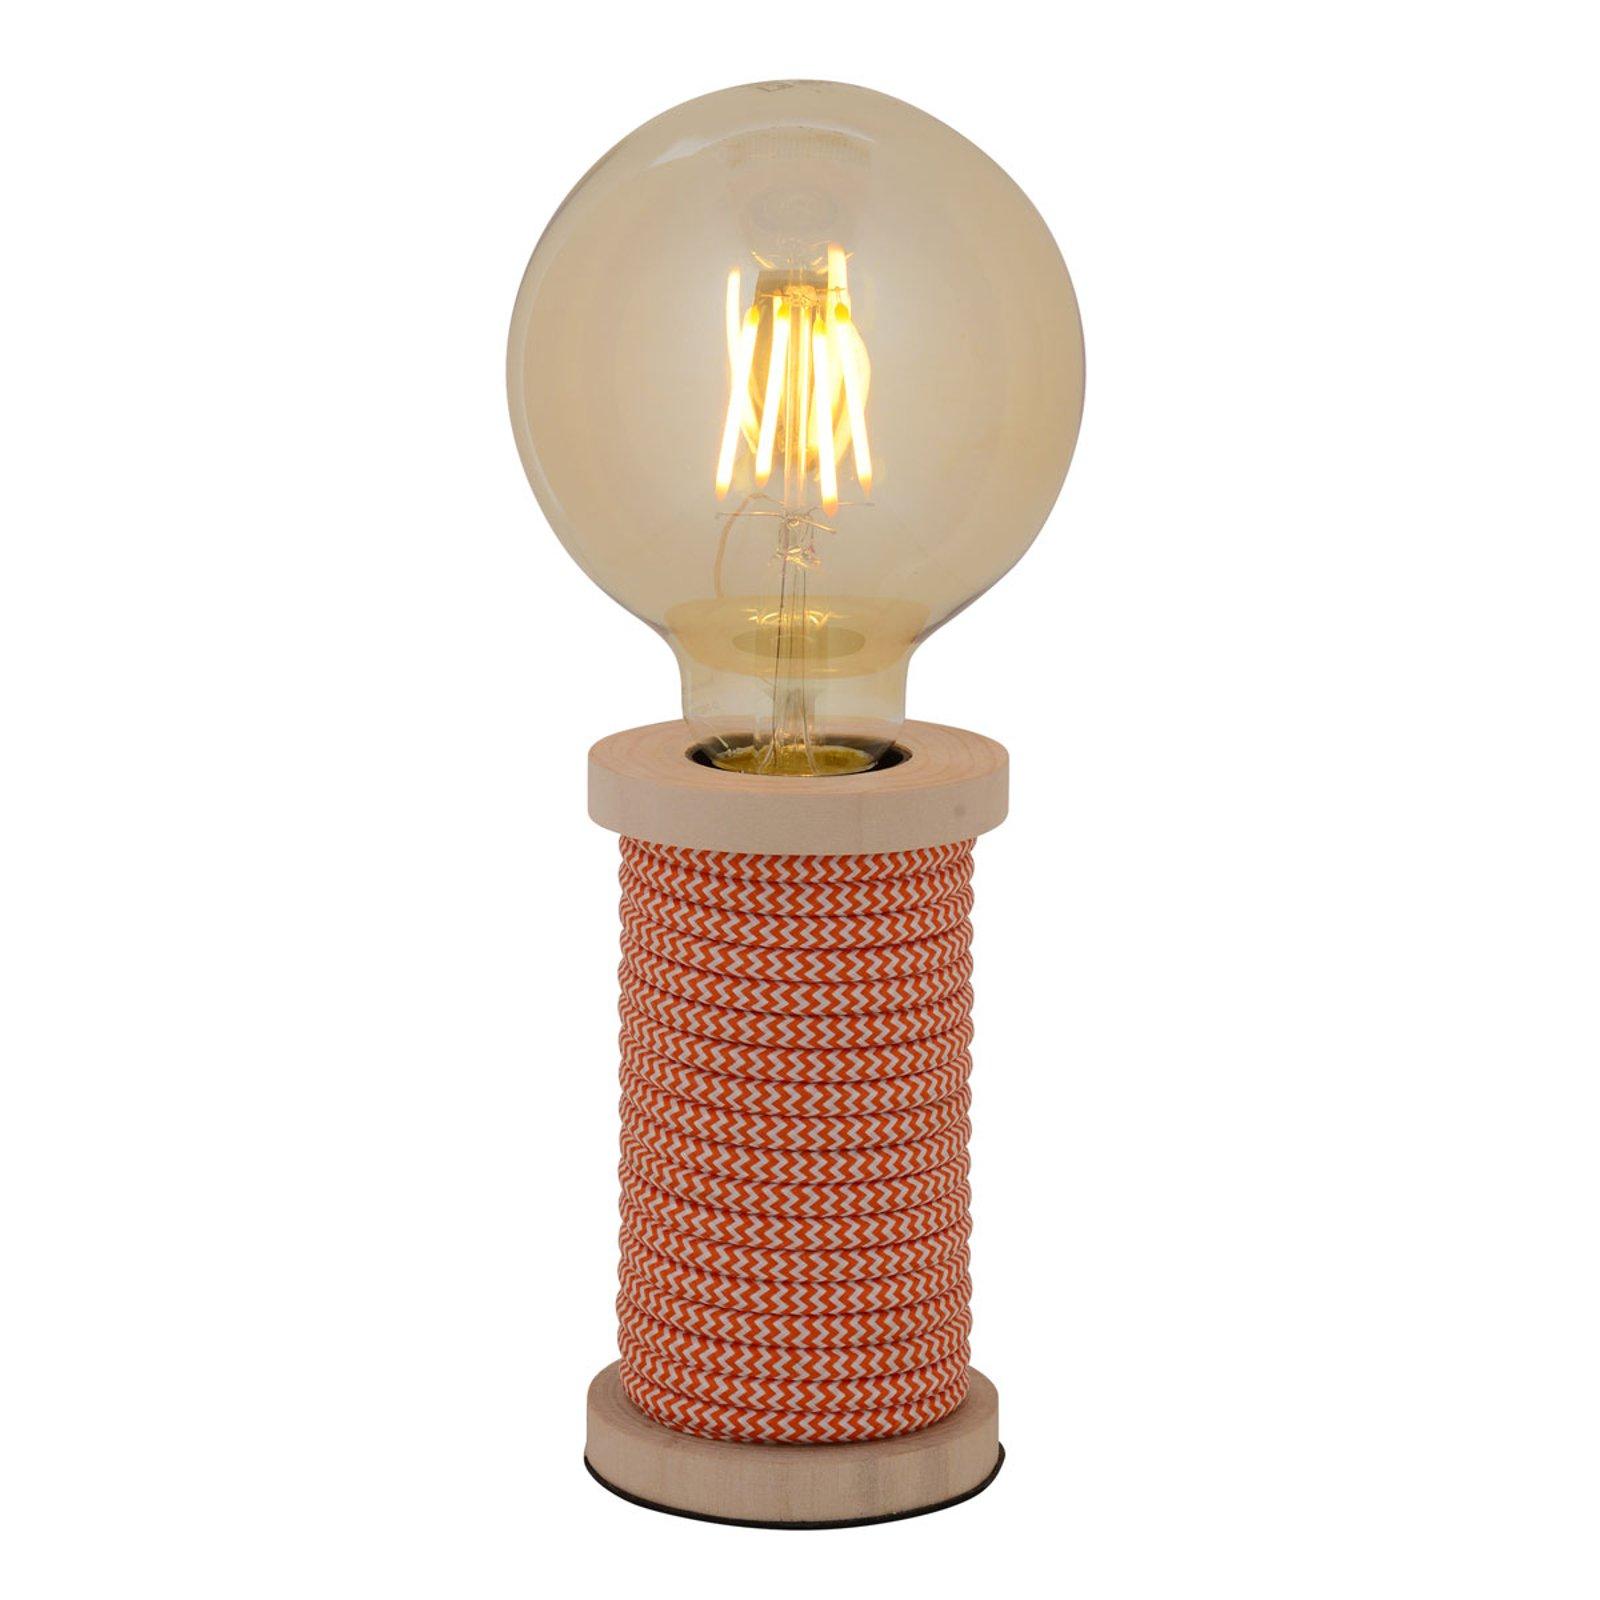 Bordlampe Max med fot i tre oransje